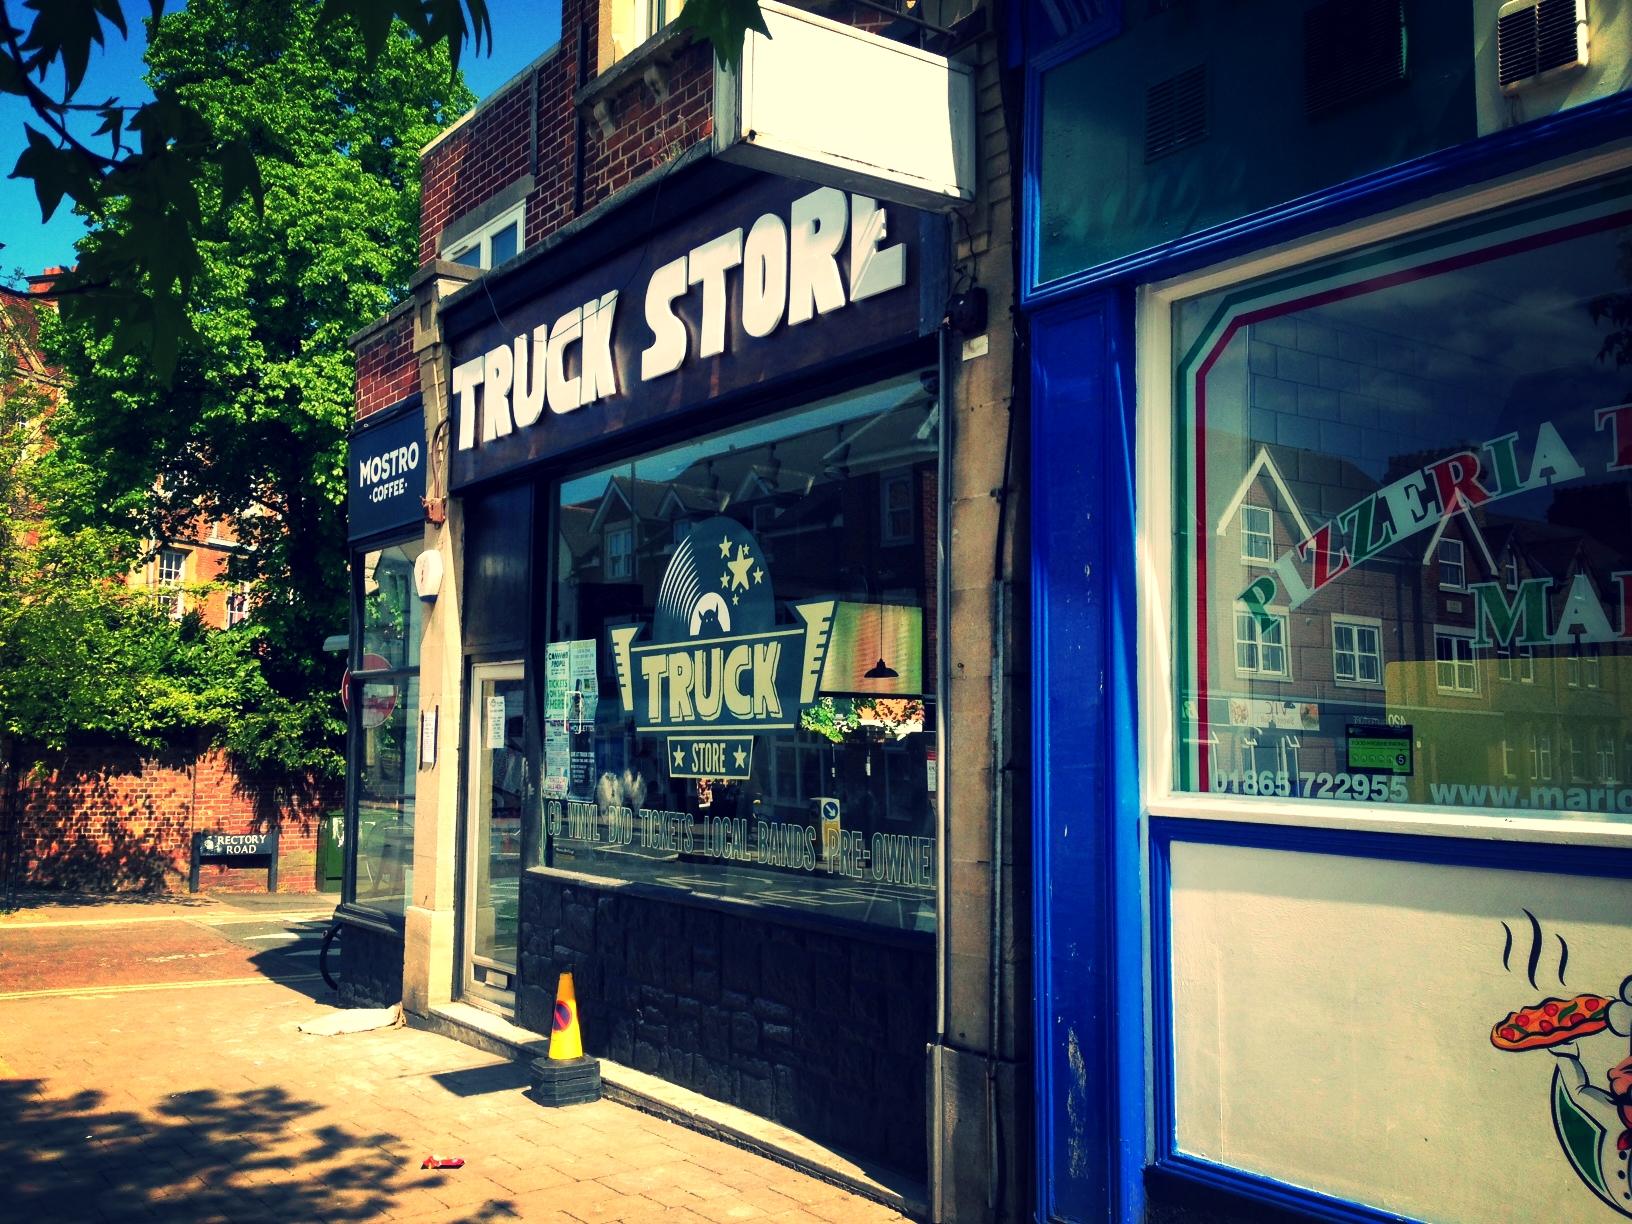 Truck Store